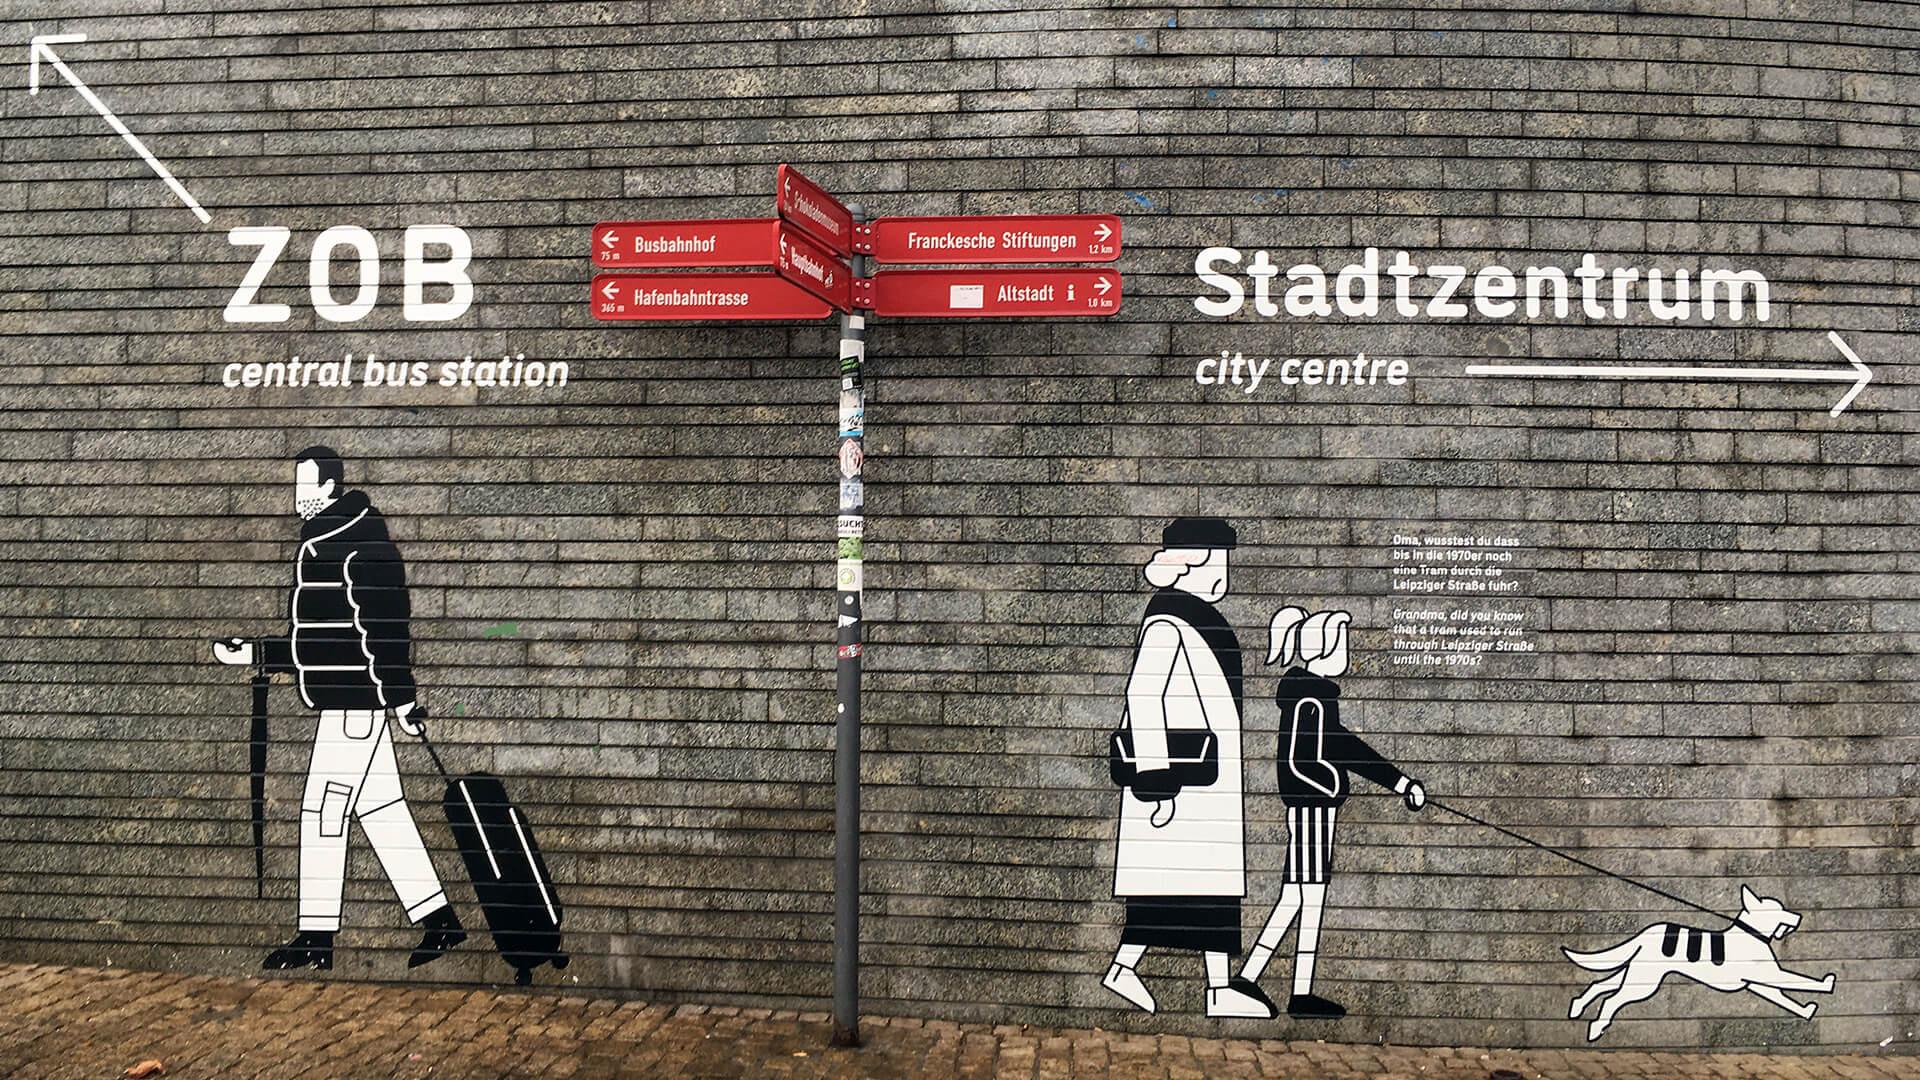 koblenz-luetzel-projekte-handlungsfelder-wegeleitsystem-zob-bahnhof-halle